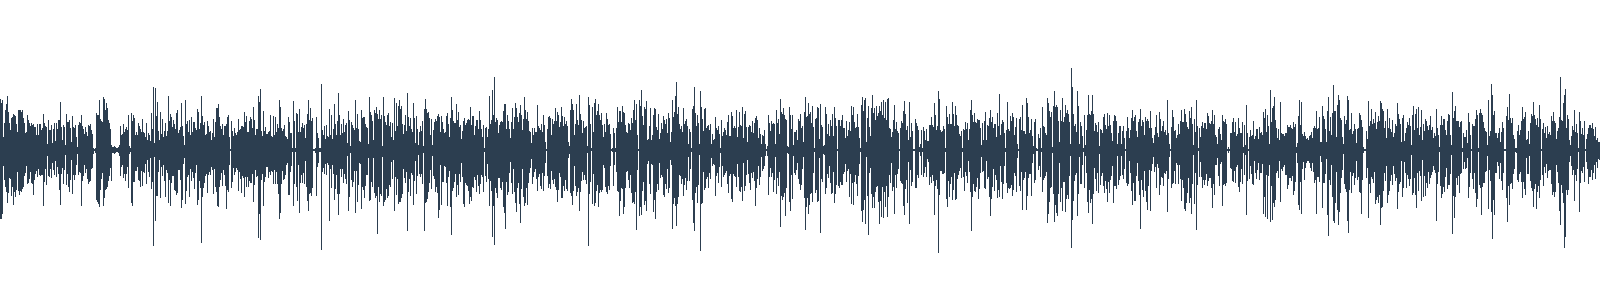 Turíčna novéna 2019 Gaboltov (1) waveform